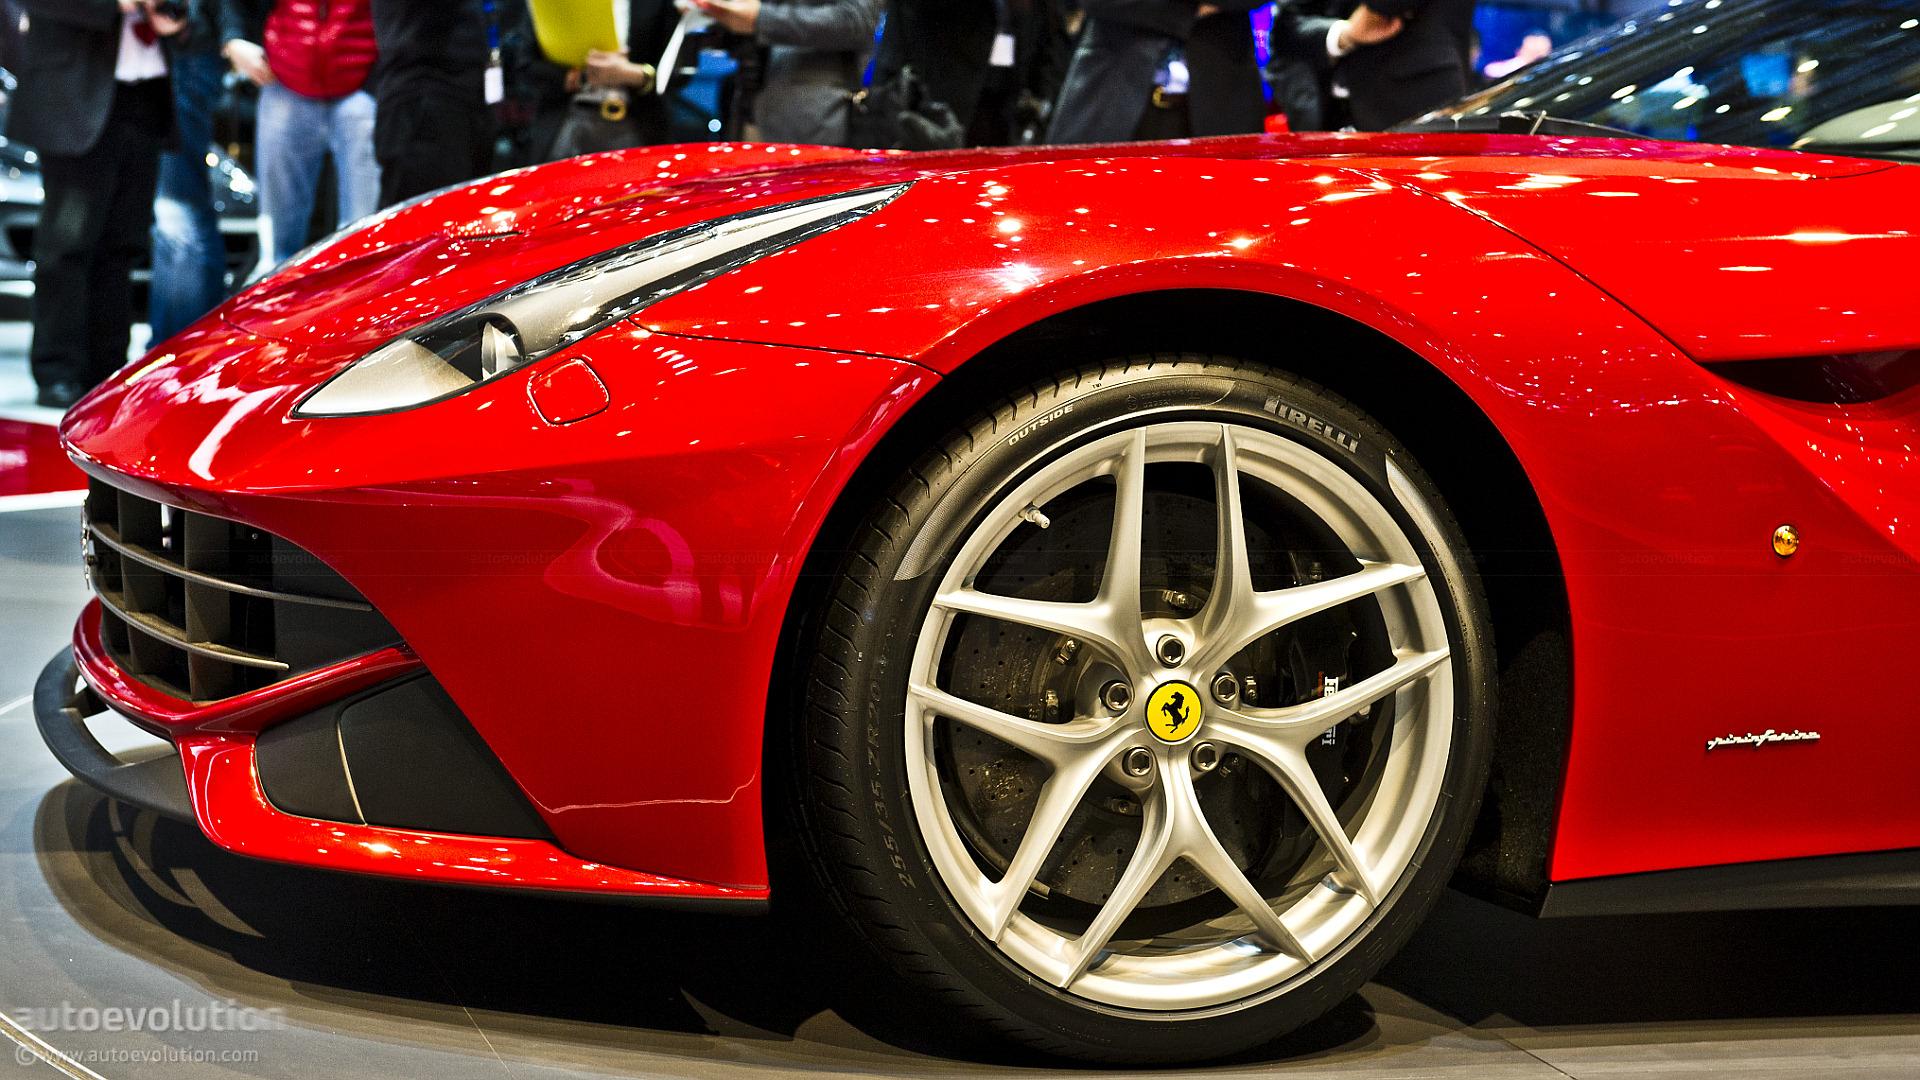 Ferrari F12 Berlinetta Tires Detailed  autoevolution